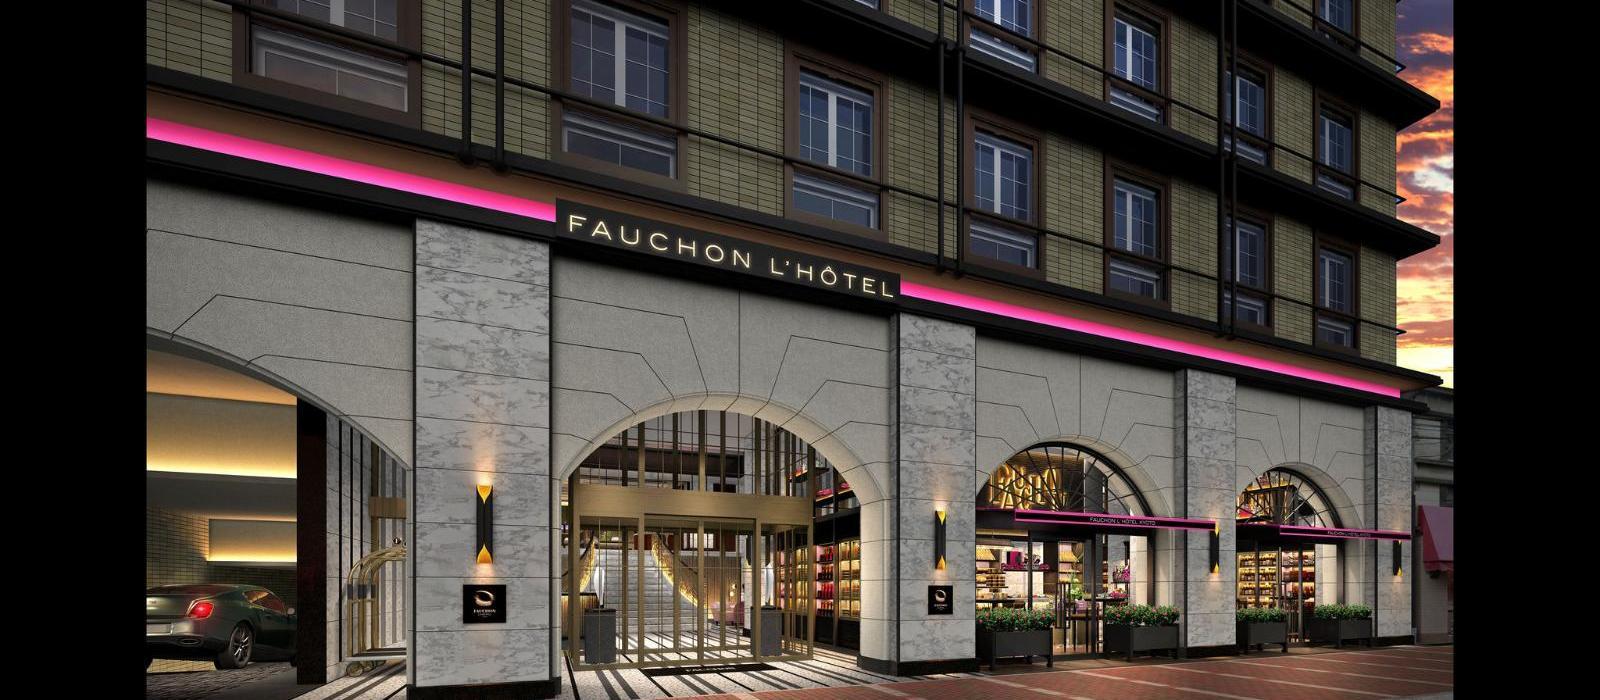 京都馥颂酒店(Fauchon Hotel Kyoto) 图片  www.lhw.cn